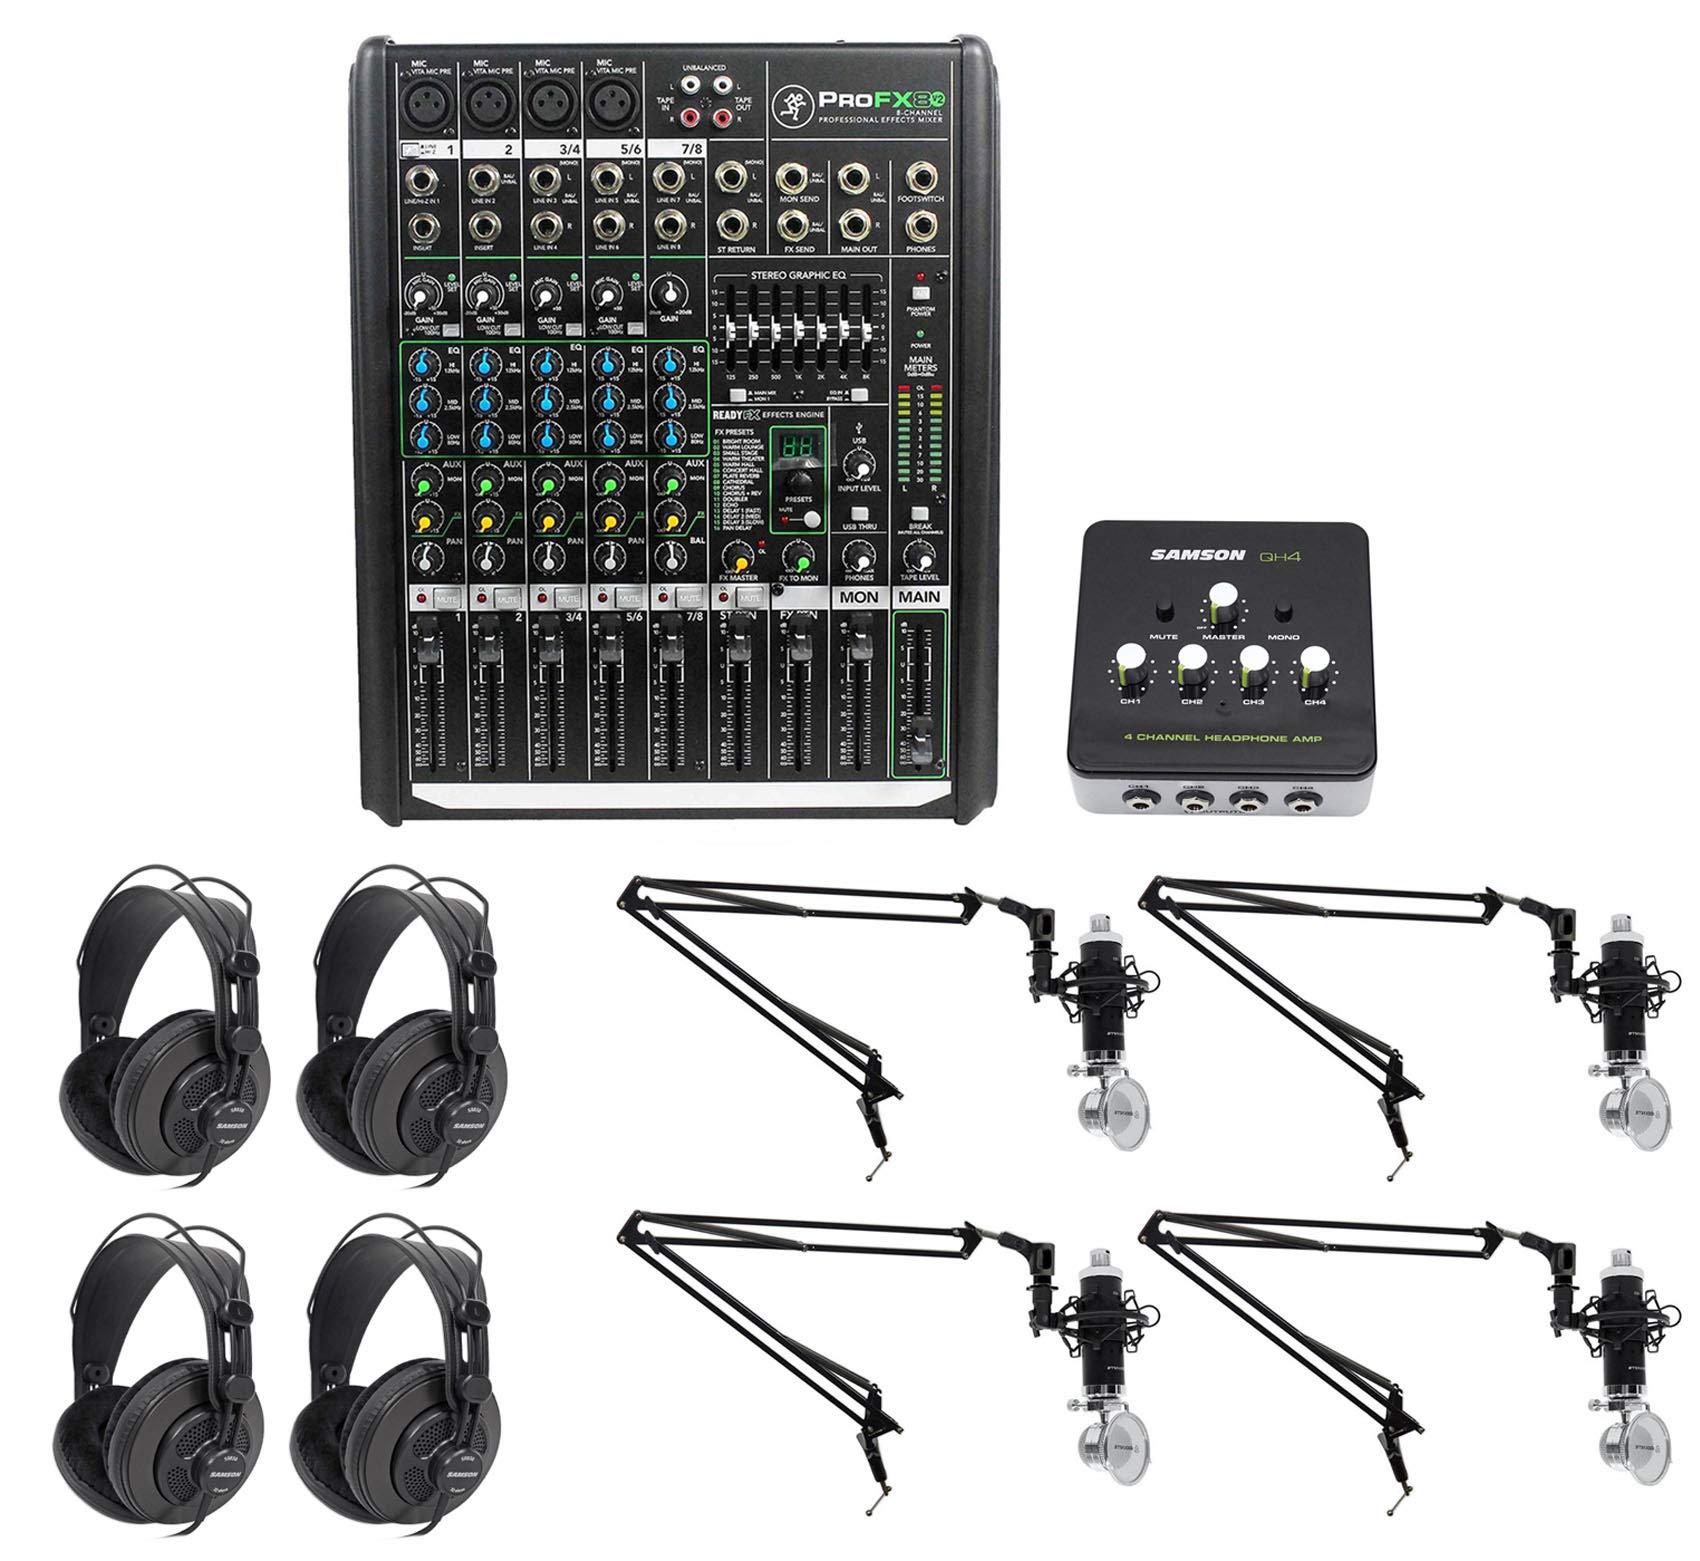 Podcast Studio Bundle w/Mackie 8-Ch Mixer+4) Mics+4) Samson Headphones+4) Booms